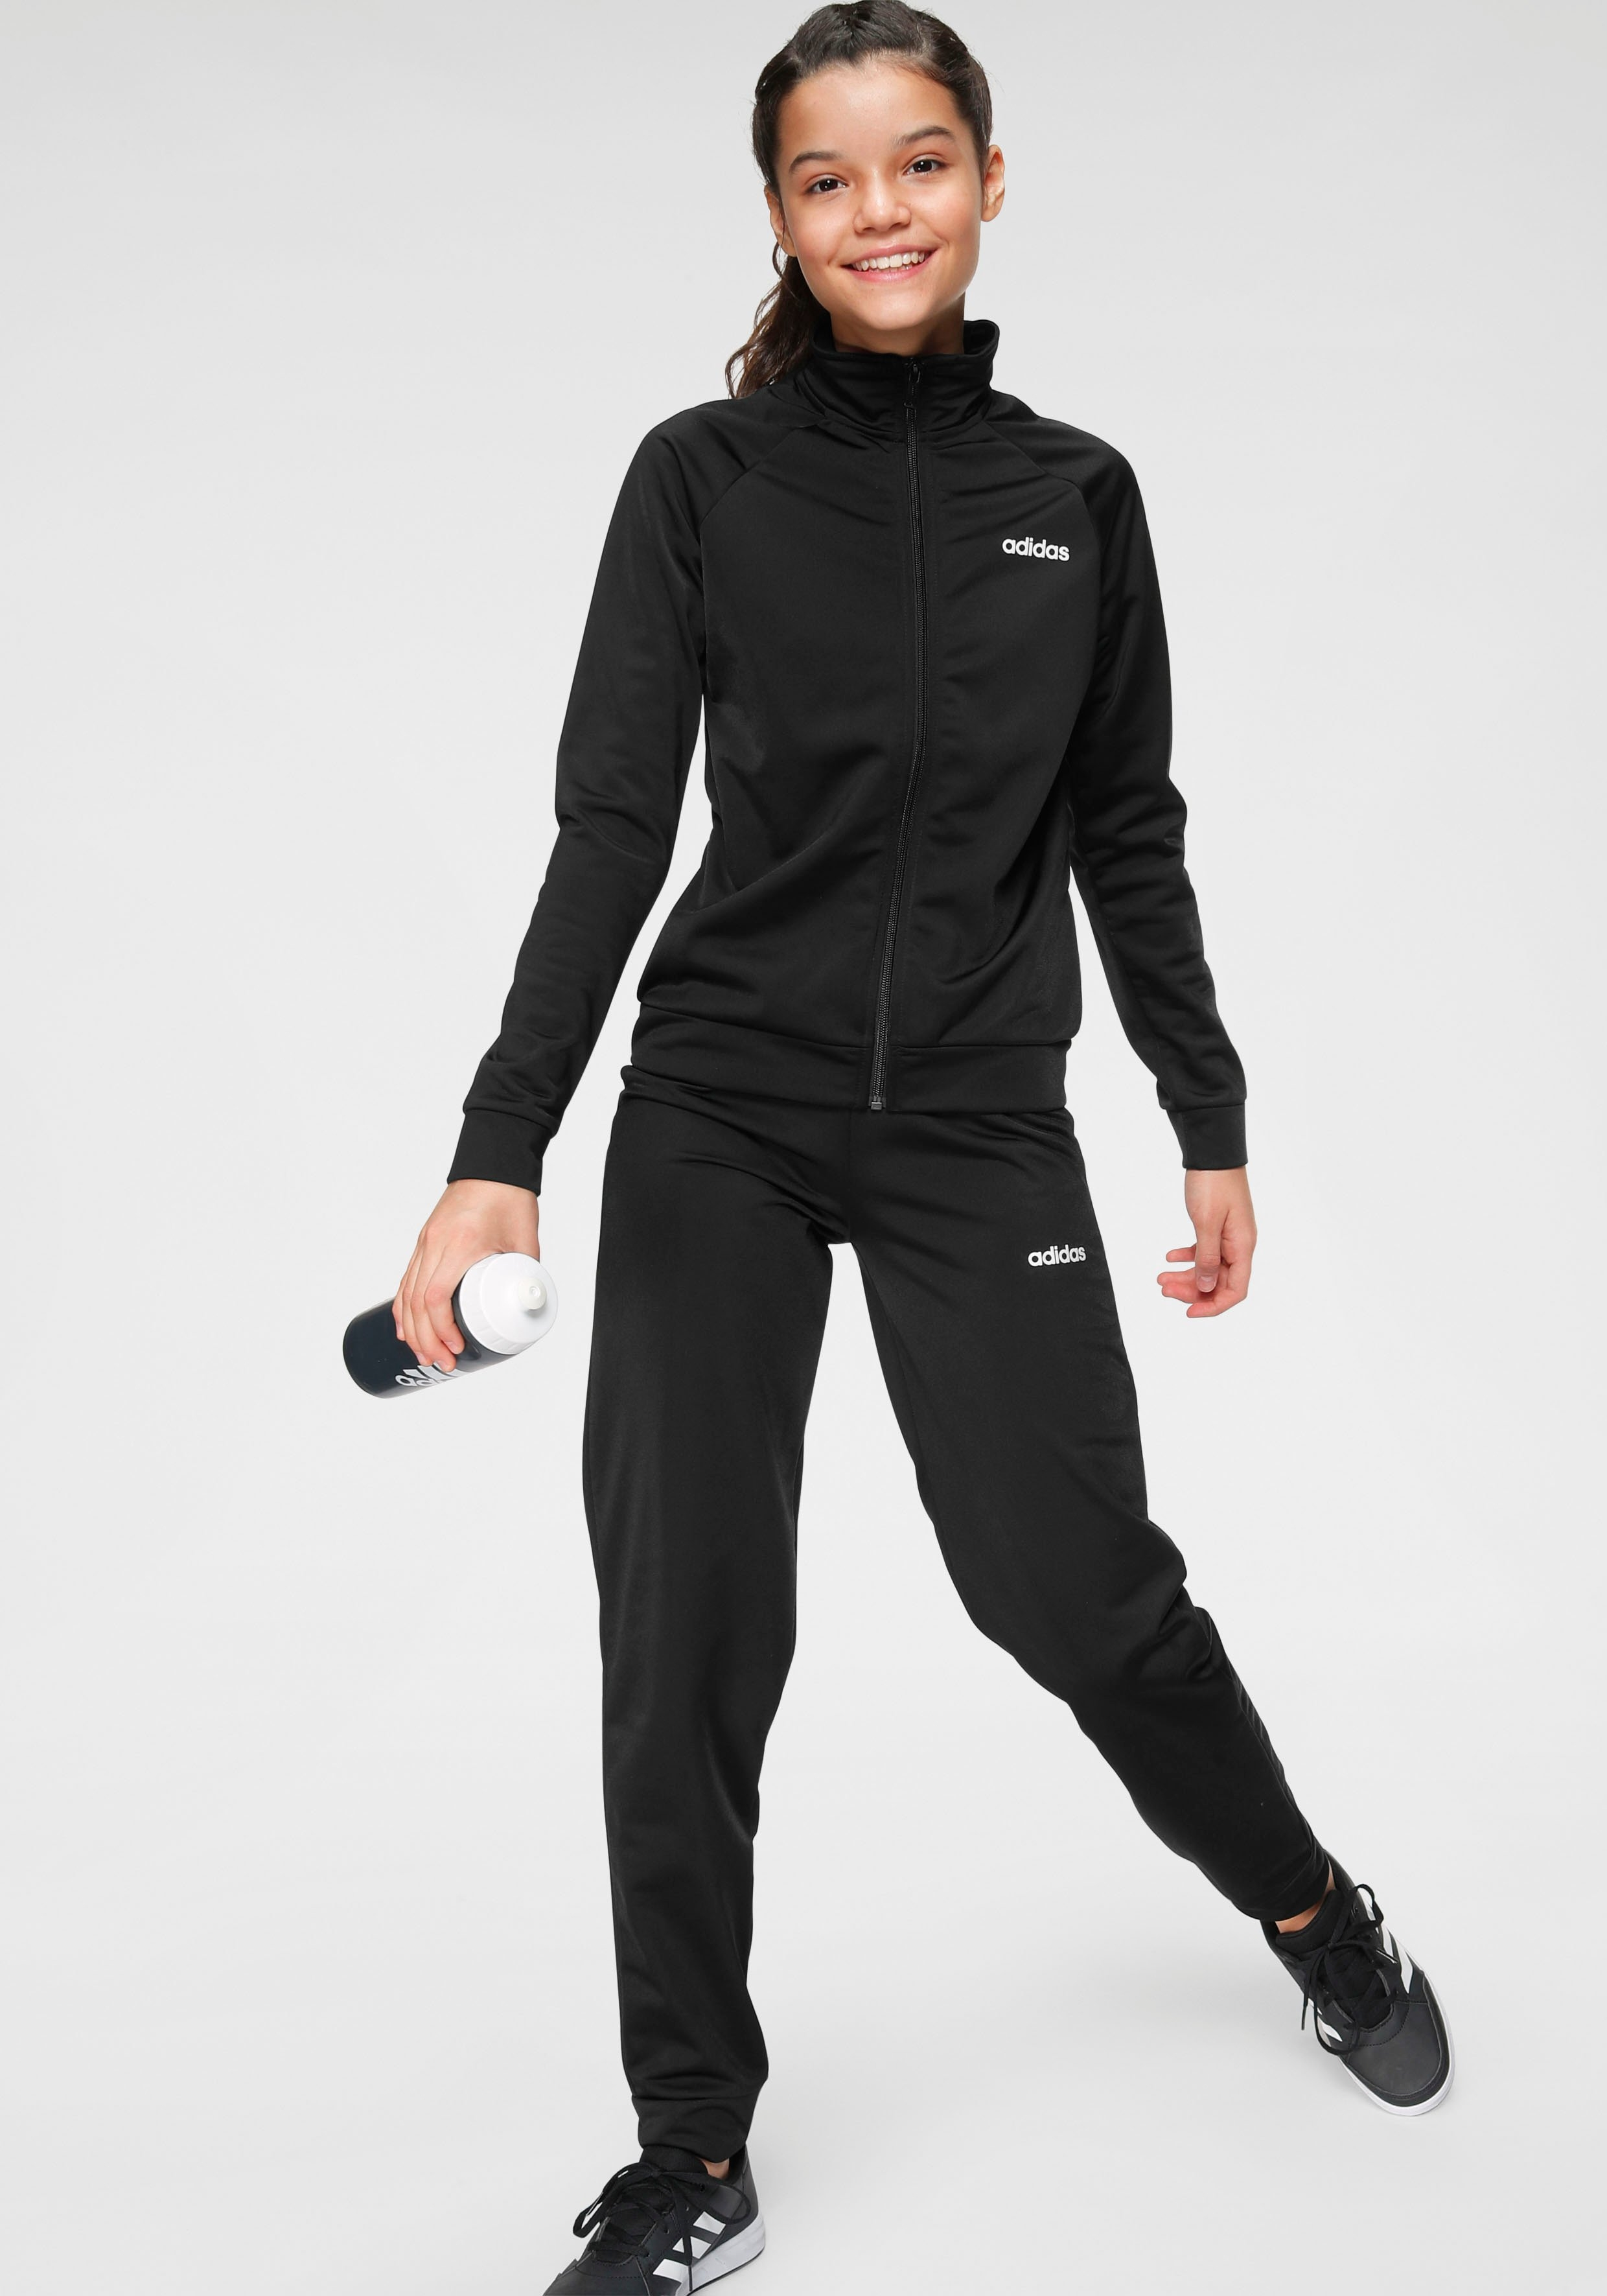 adidas Performance trainingspak »YOUTH GIRL TRACKSUIT« - gratis ruilen op otto.nl